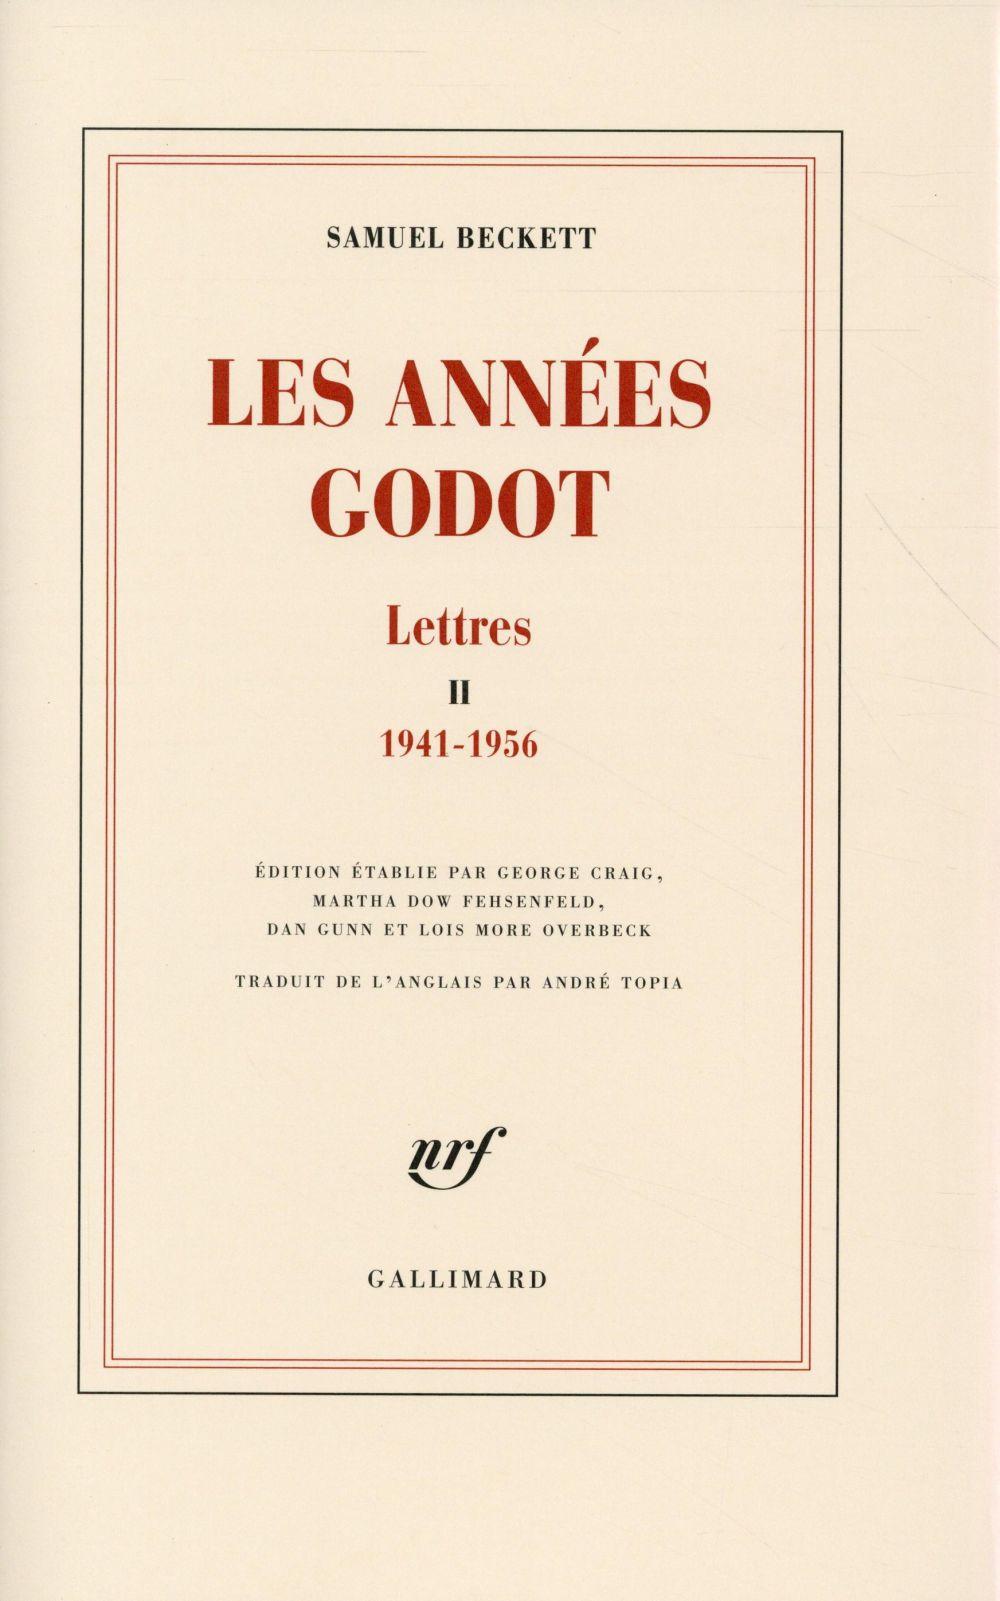 LETTRES, II : LES ANNEES GODOT   (1941 1956)